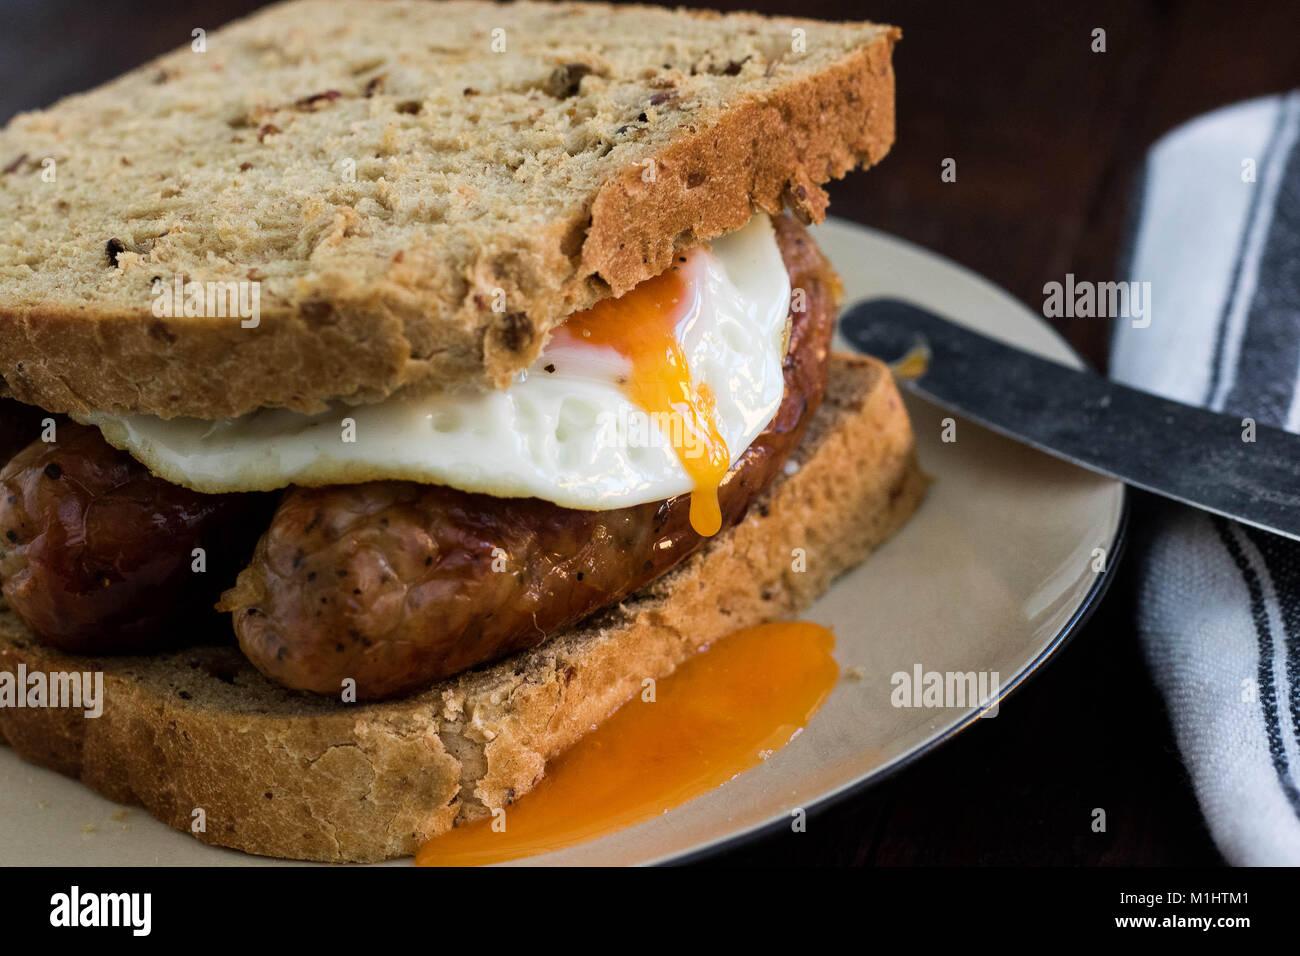 Sausage & Egg Sandwich - Stock Image